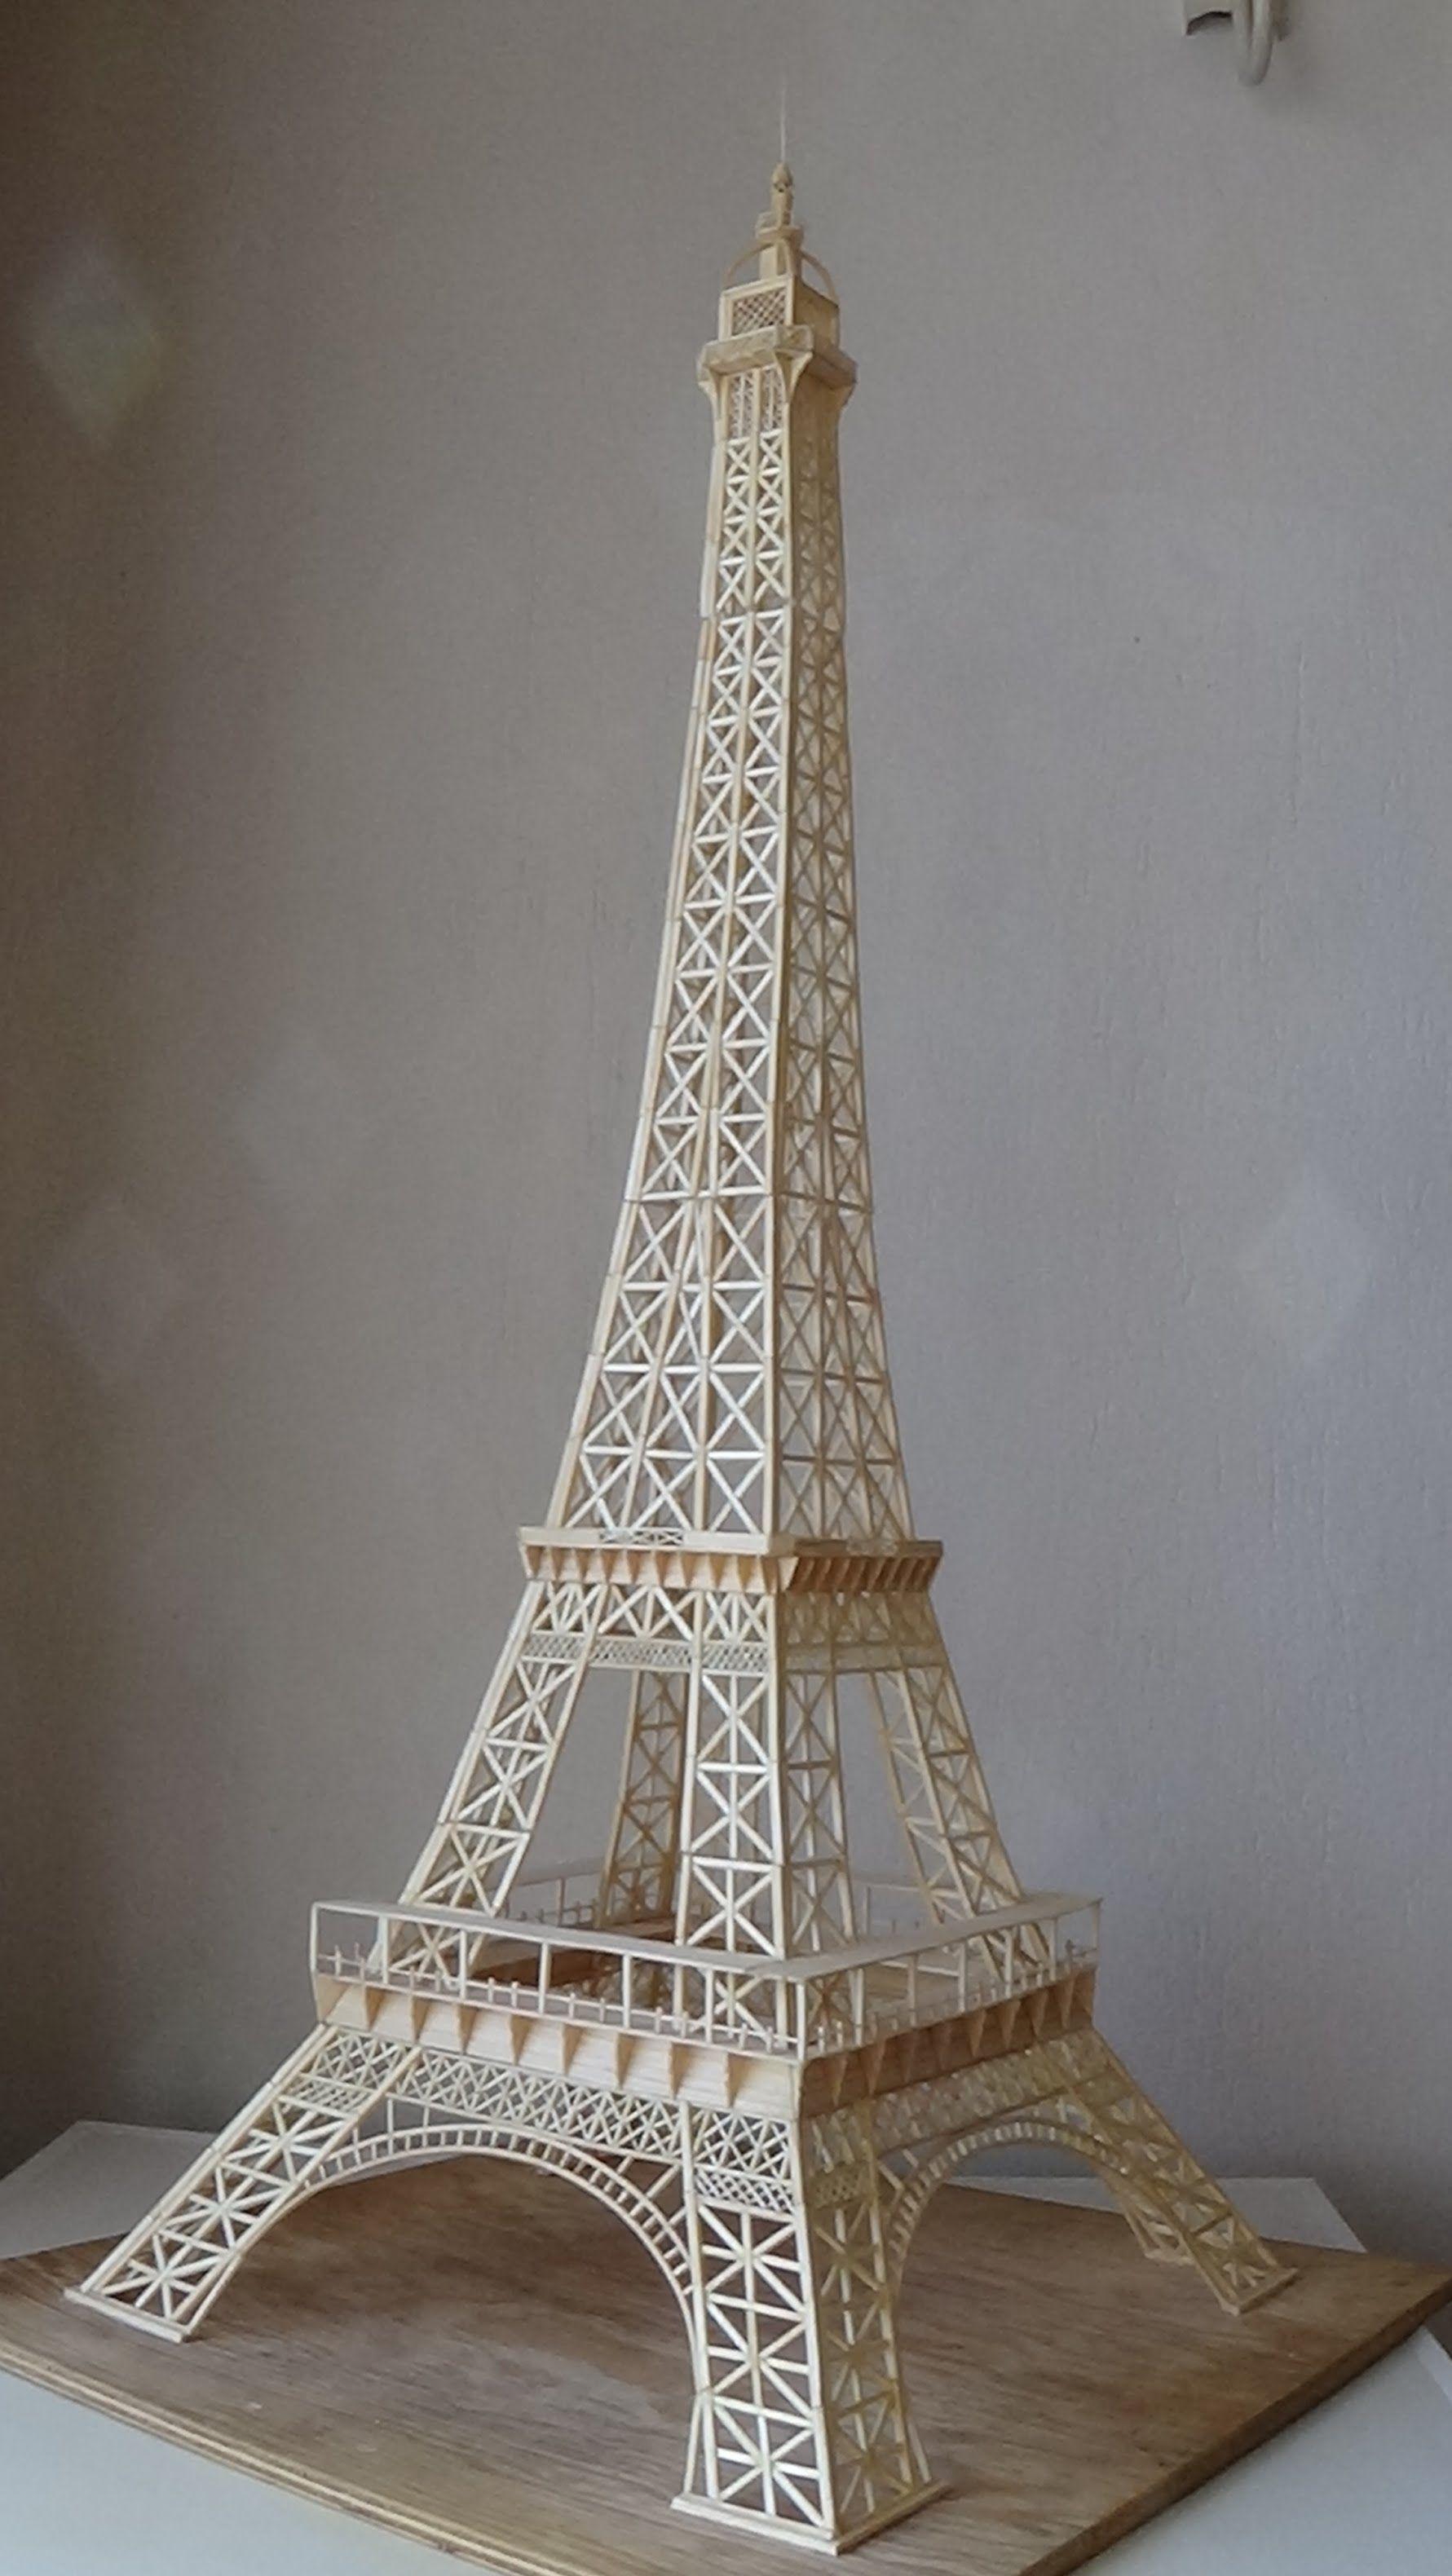 Make Eiffel Tower With Sticks